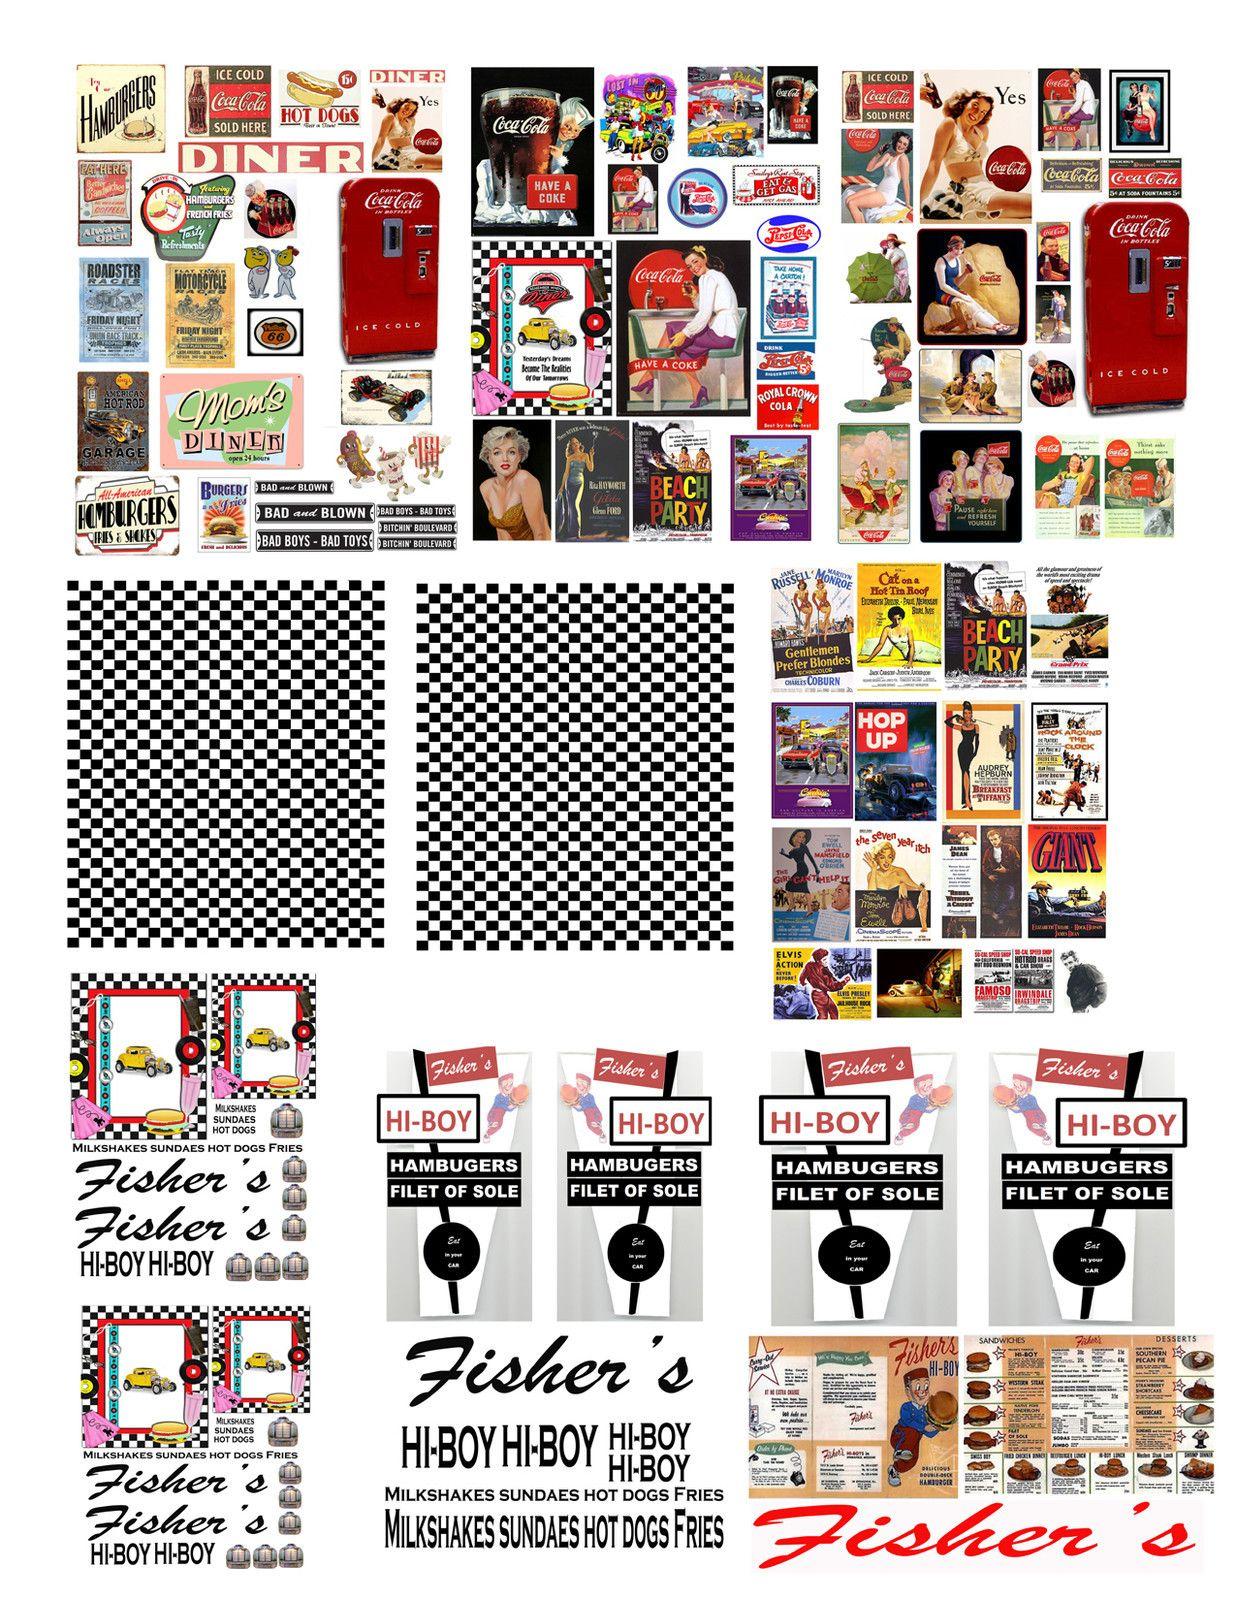 1 43 Decals For Matchbox Small Model Dioramas Diner 10 99 Diorama Paper Models Miniature Printables [ 1600 x 1236 Pixel ]